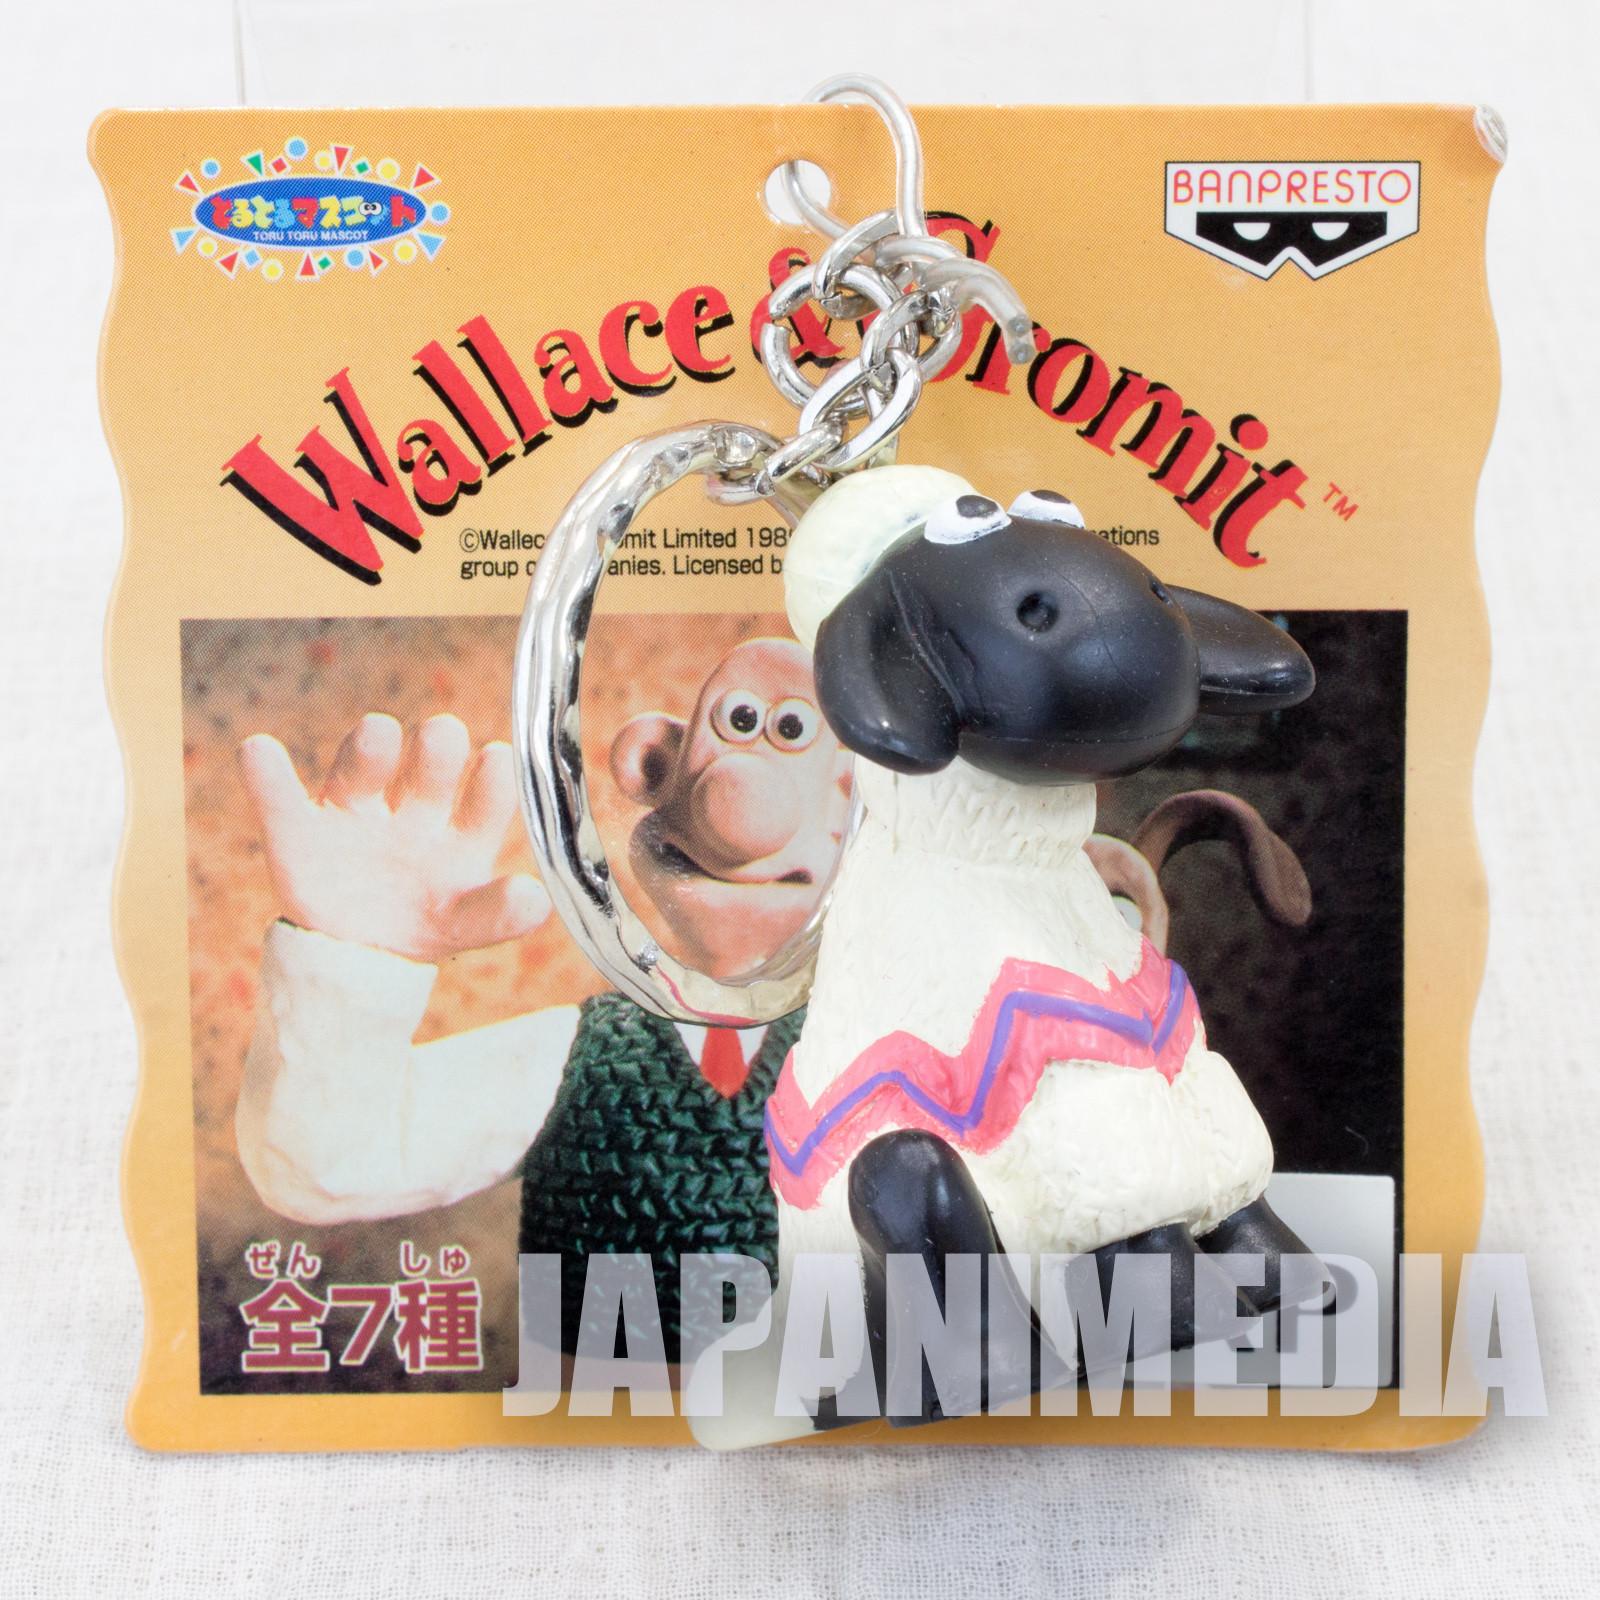 Wallace & Gromit Shaun Figure Key Chain Banpresto JAPAN Ardman